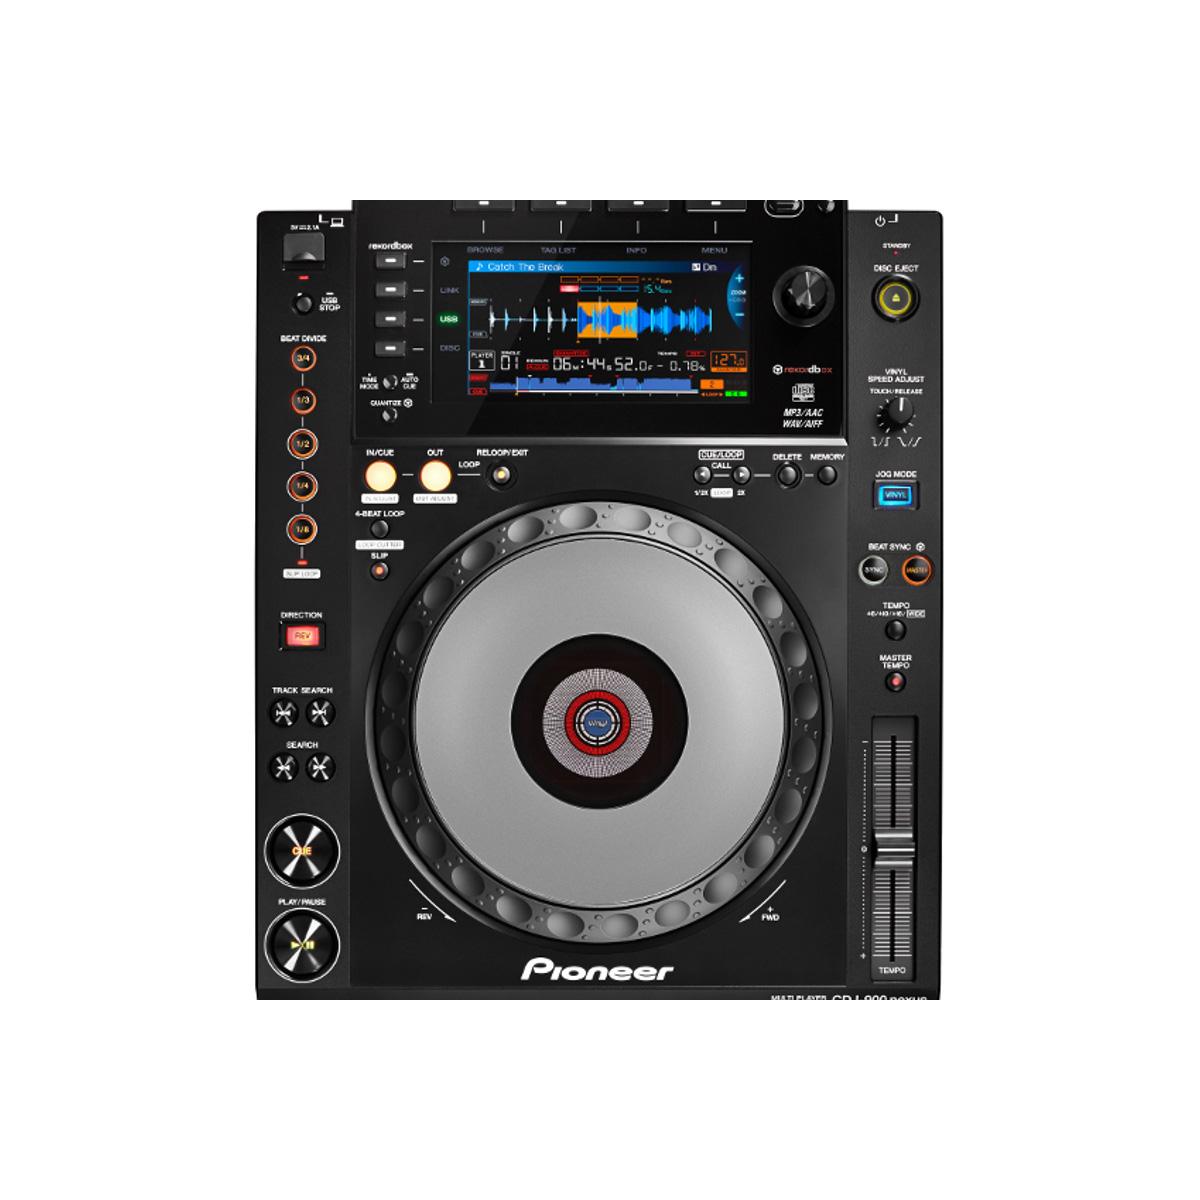 Pioneer Cdj 900 Nexus | Mak Audio dj | Loja Virtual